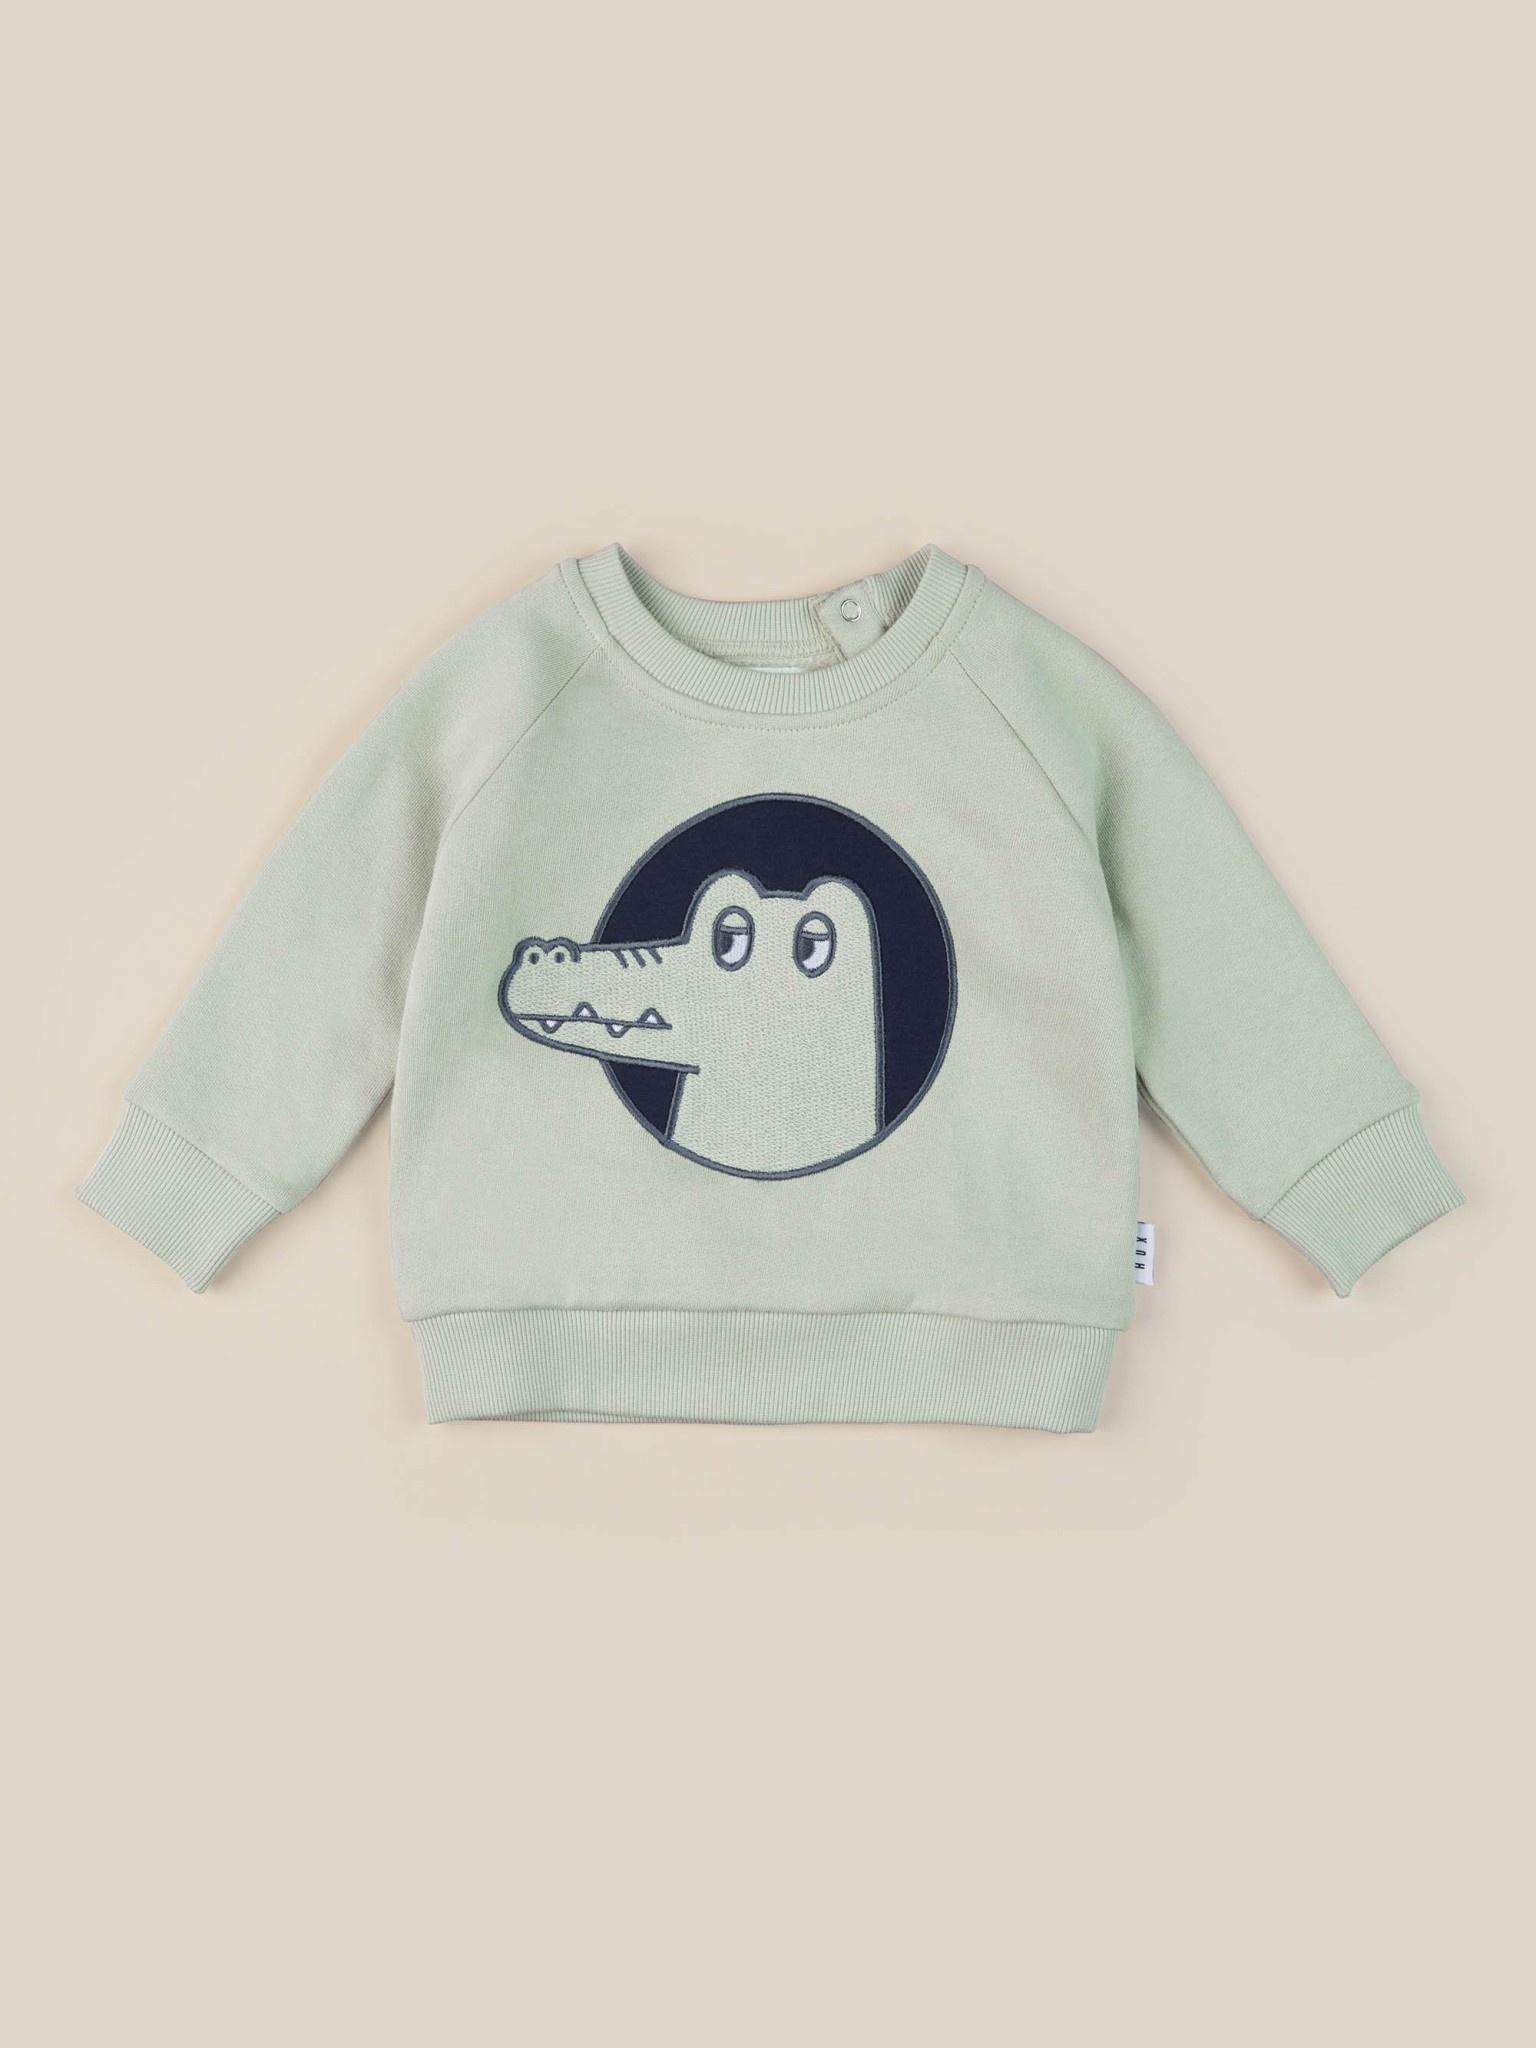 HUX BABY Croc-O-Gator Sewatshirt